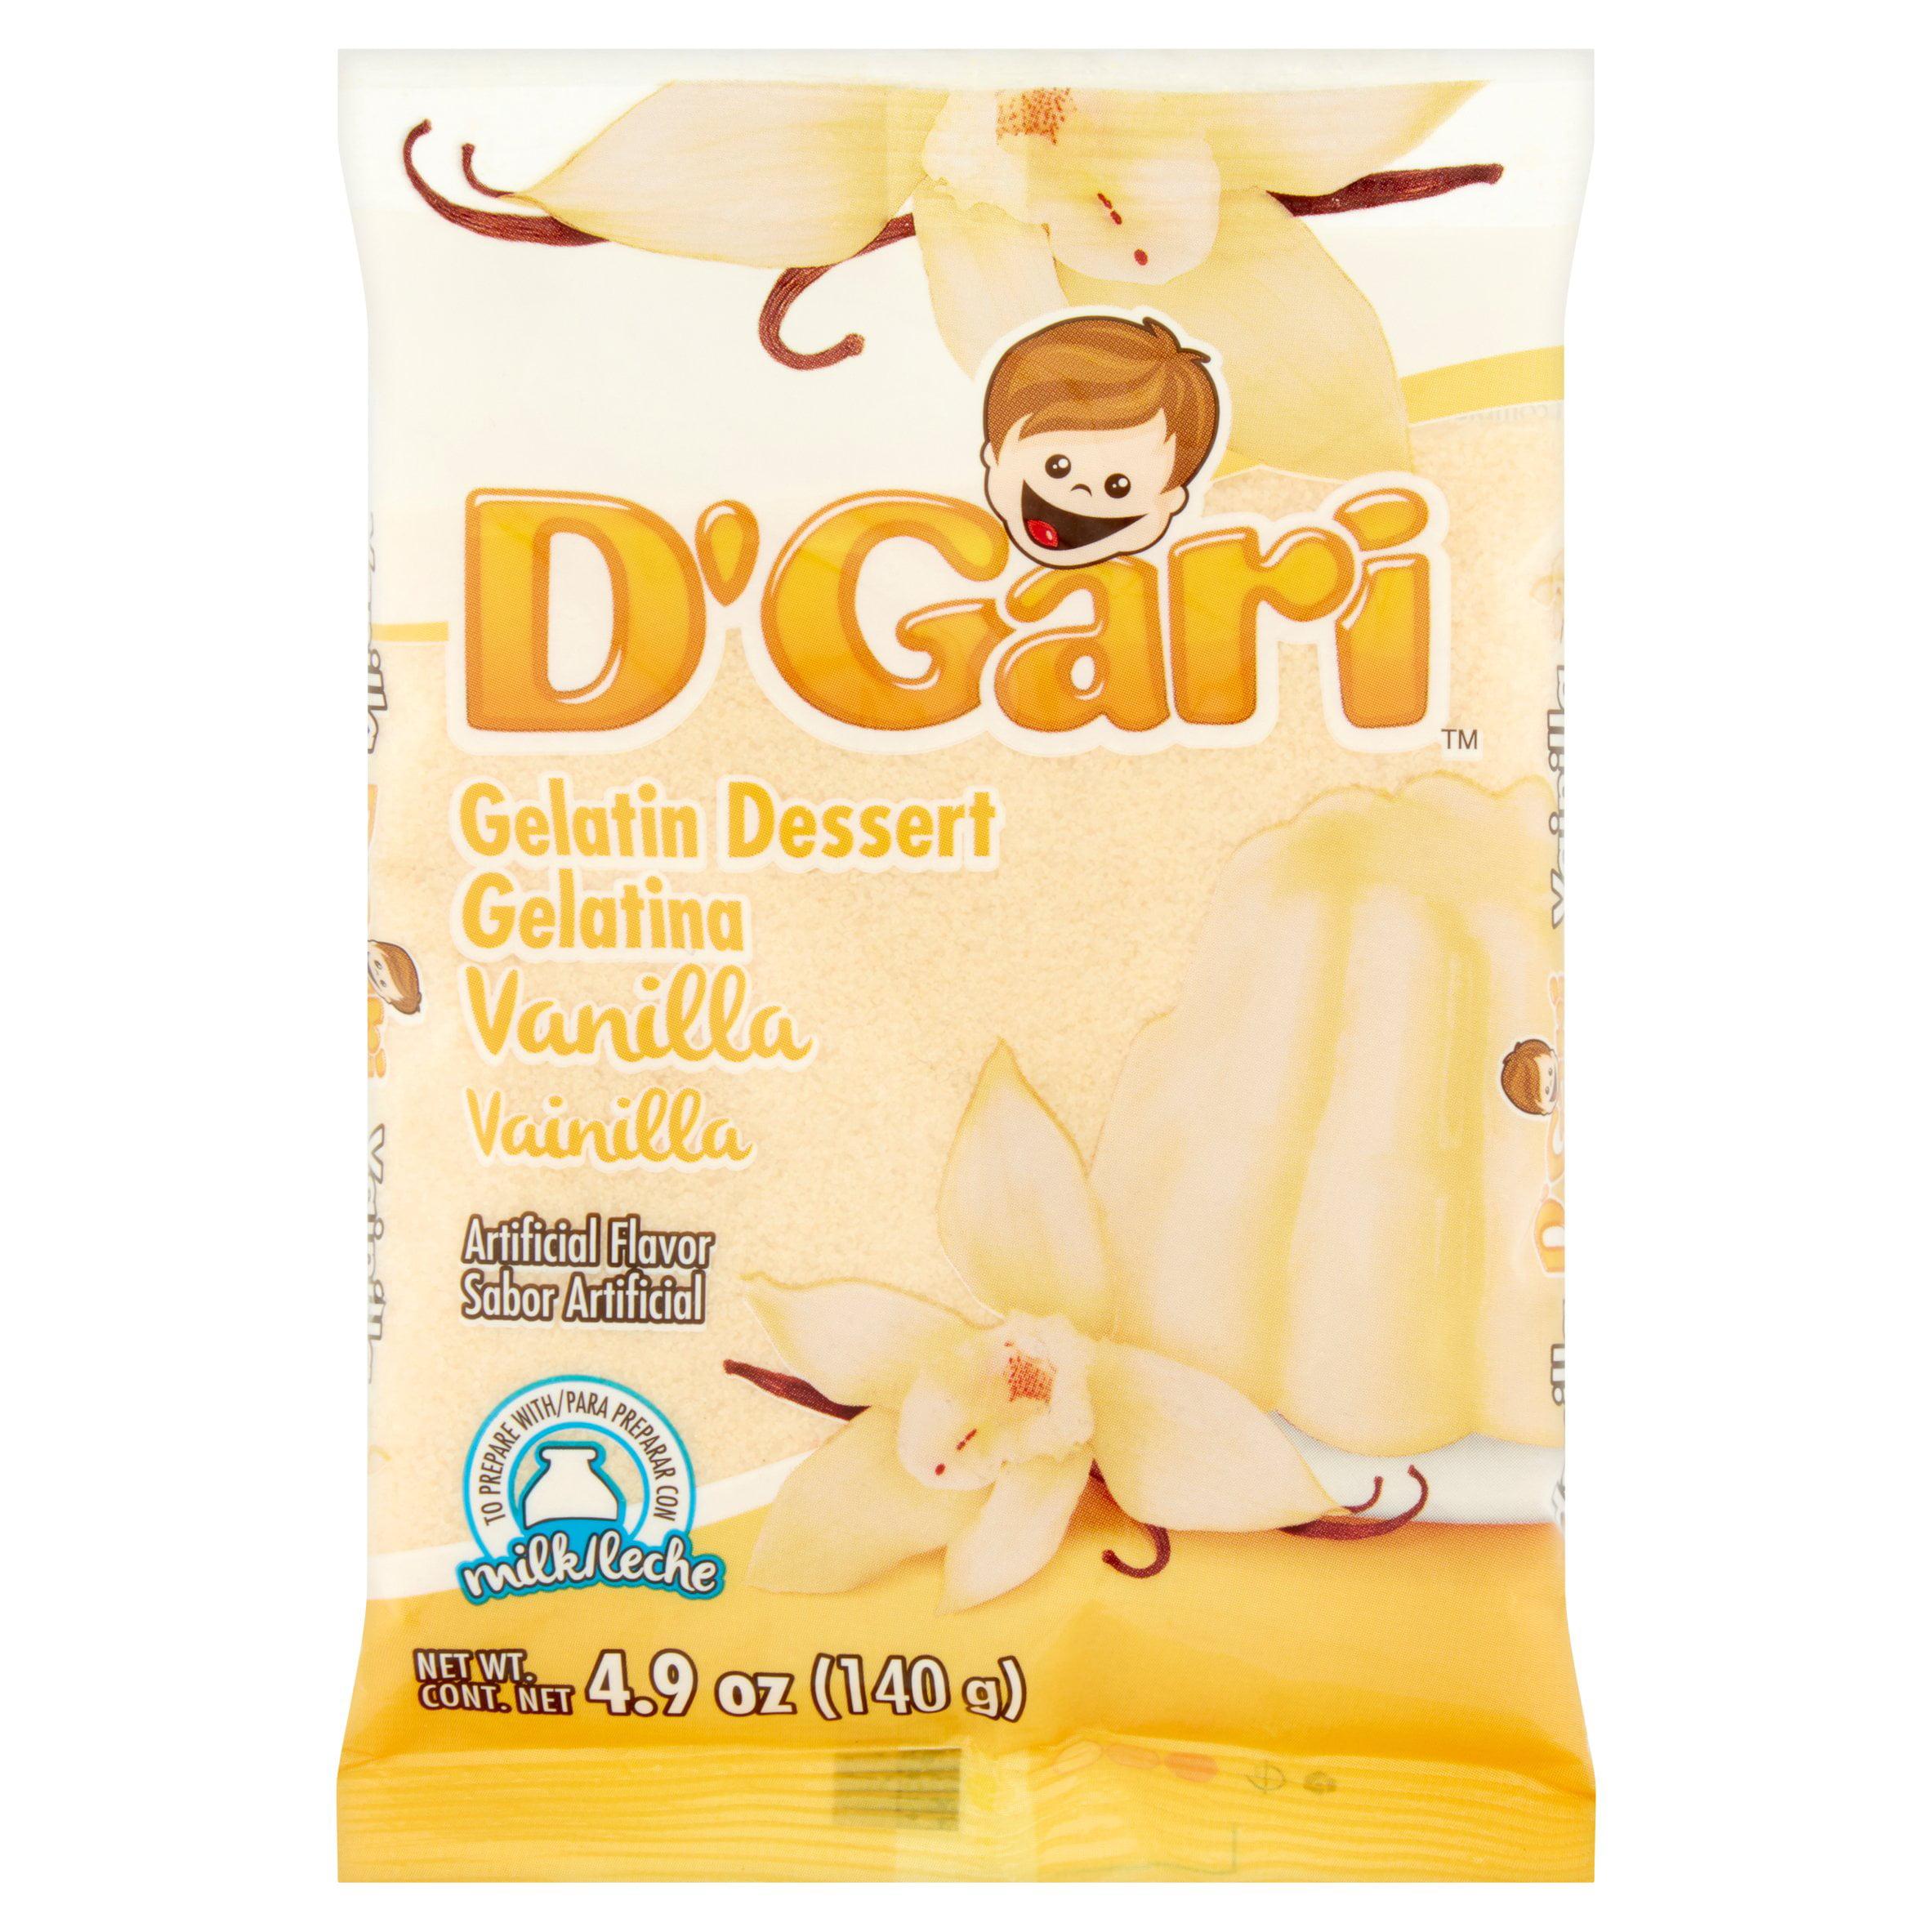 (3 Pack) D'Gari Vanilla Gelatin Dessert, 4.9 oz